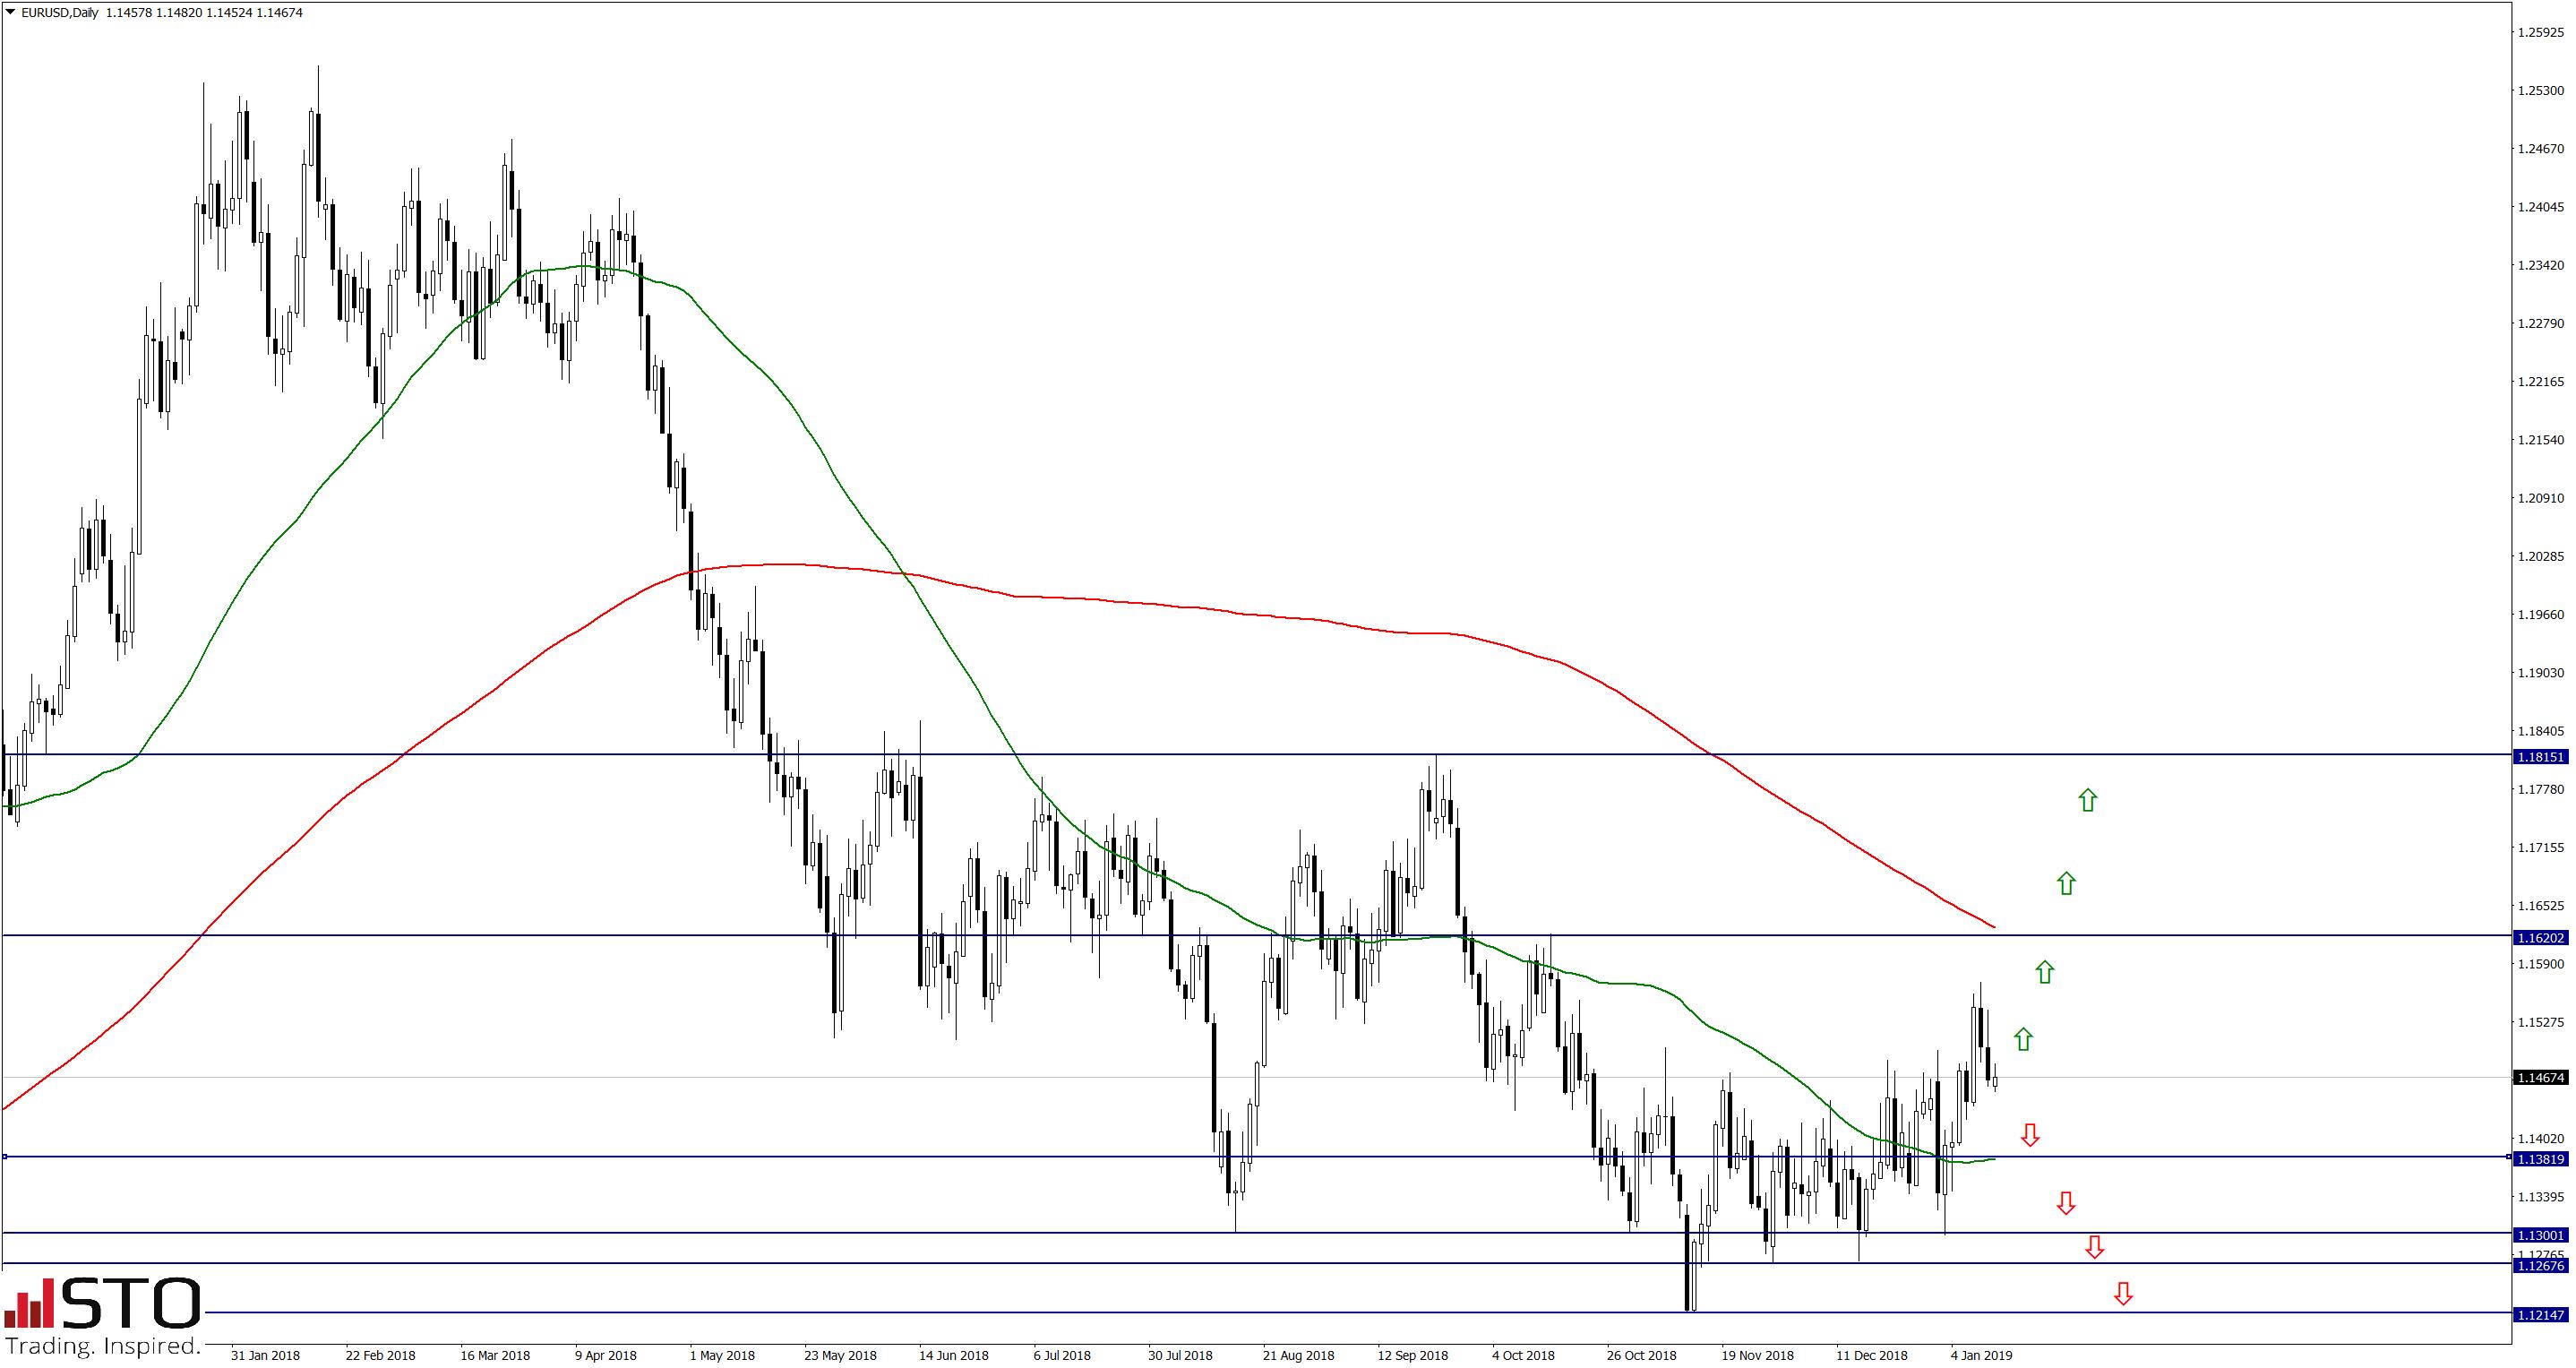 EUR/USD z celem na 1.12 – ocenia Commerzbank i ING